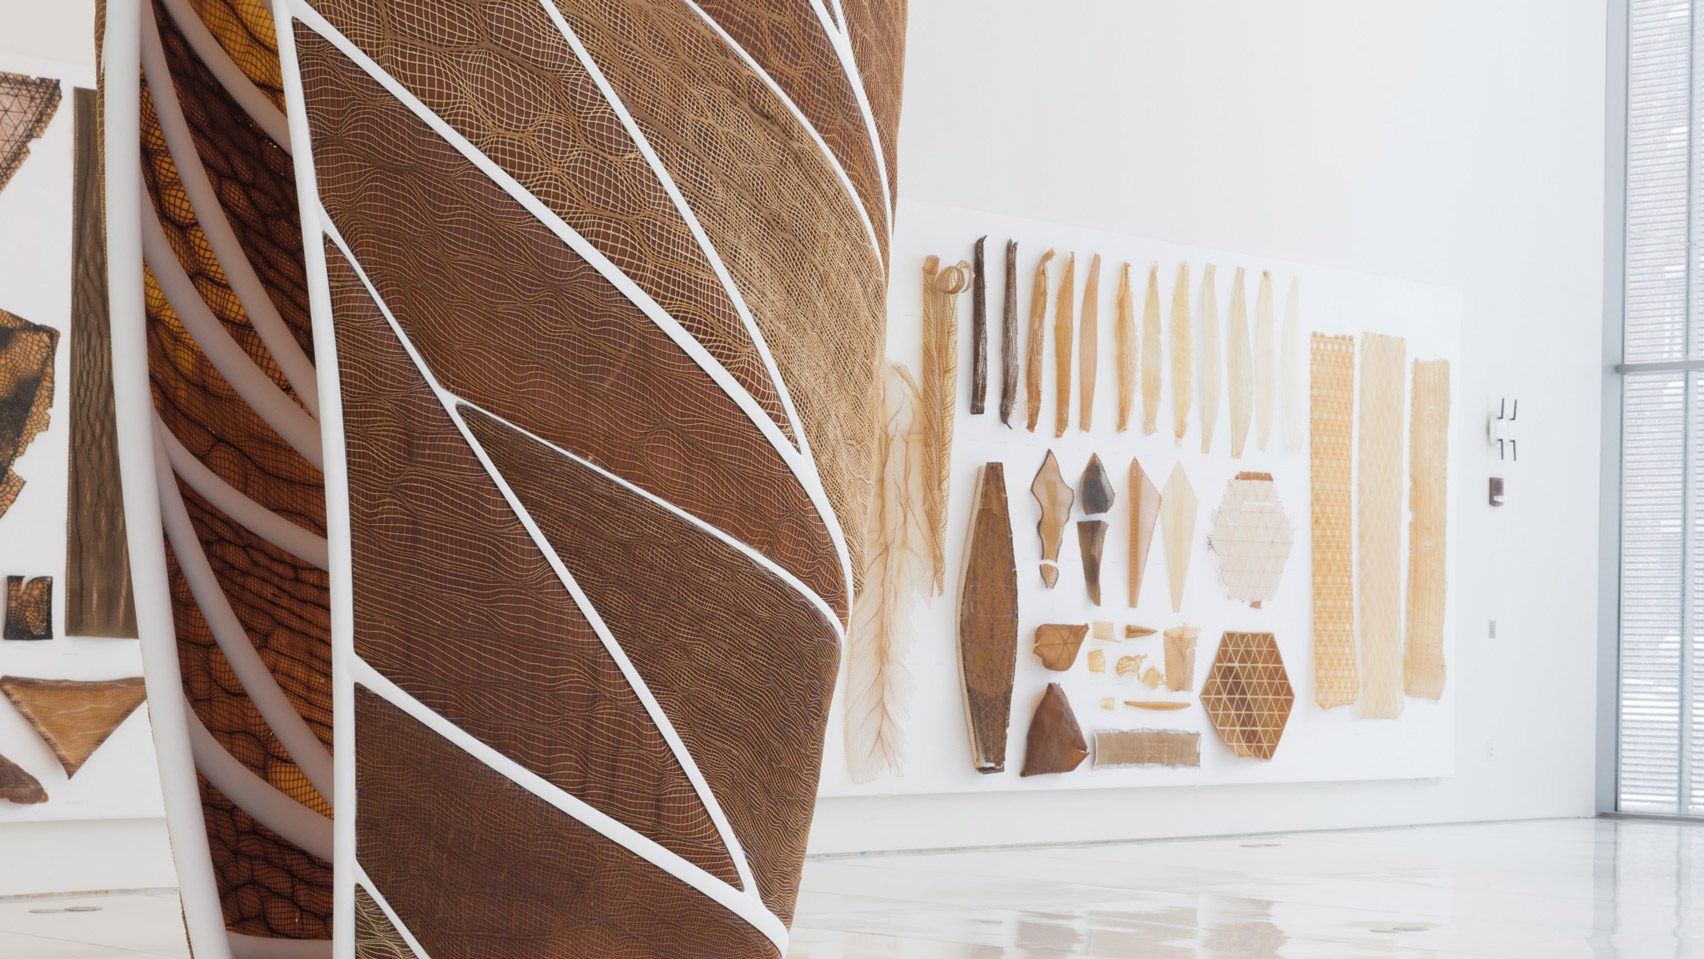 Aguahoja I by MIT Media Lab